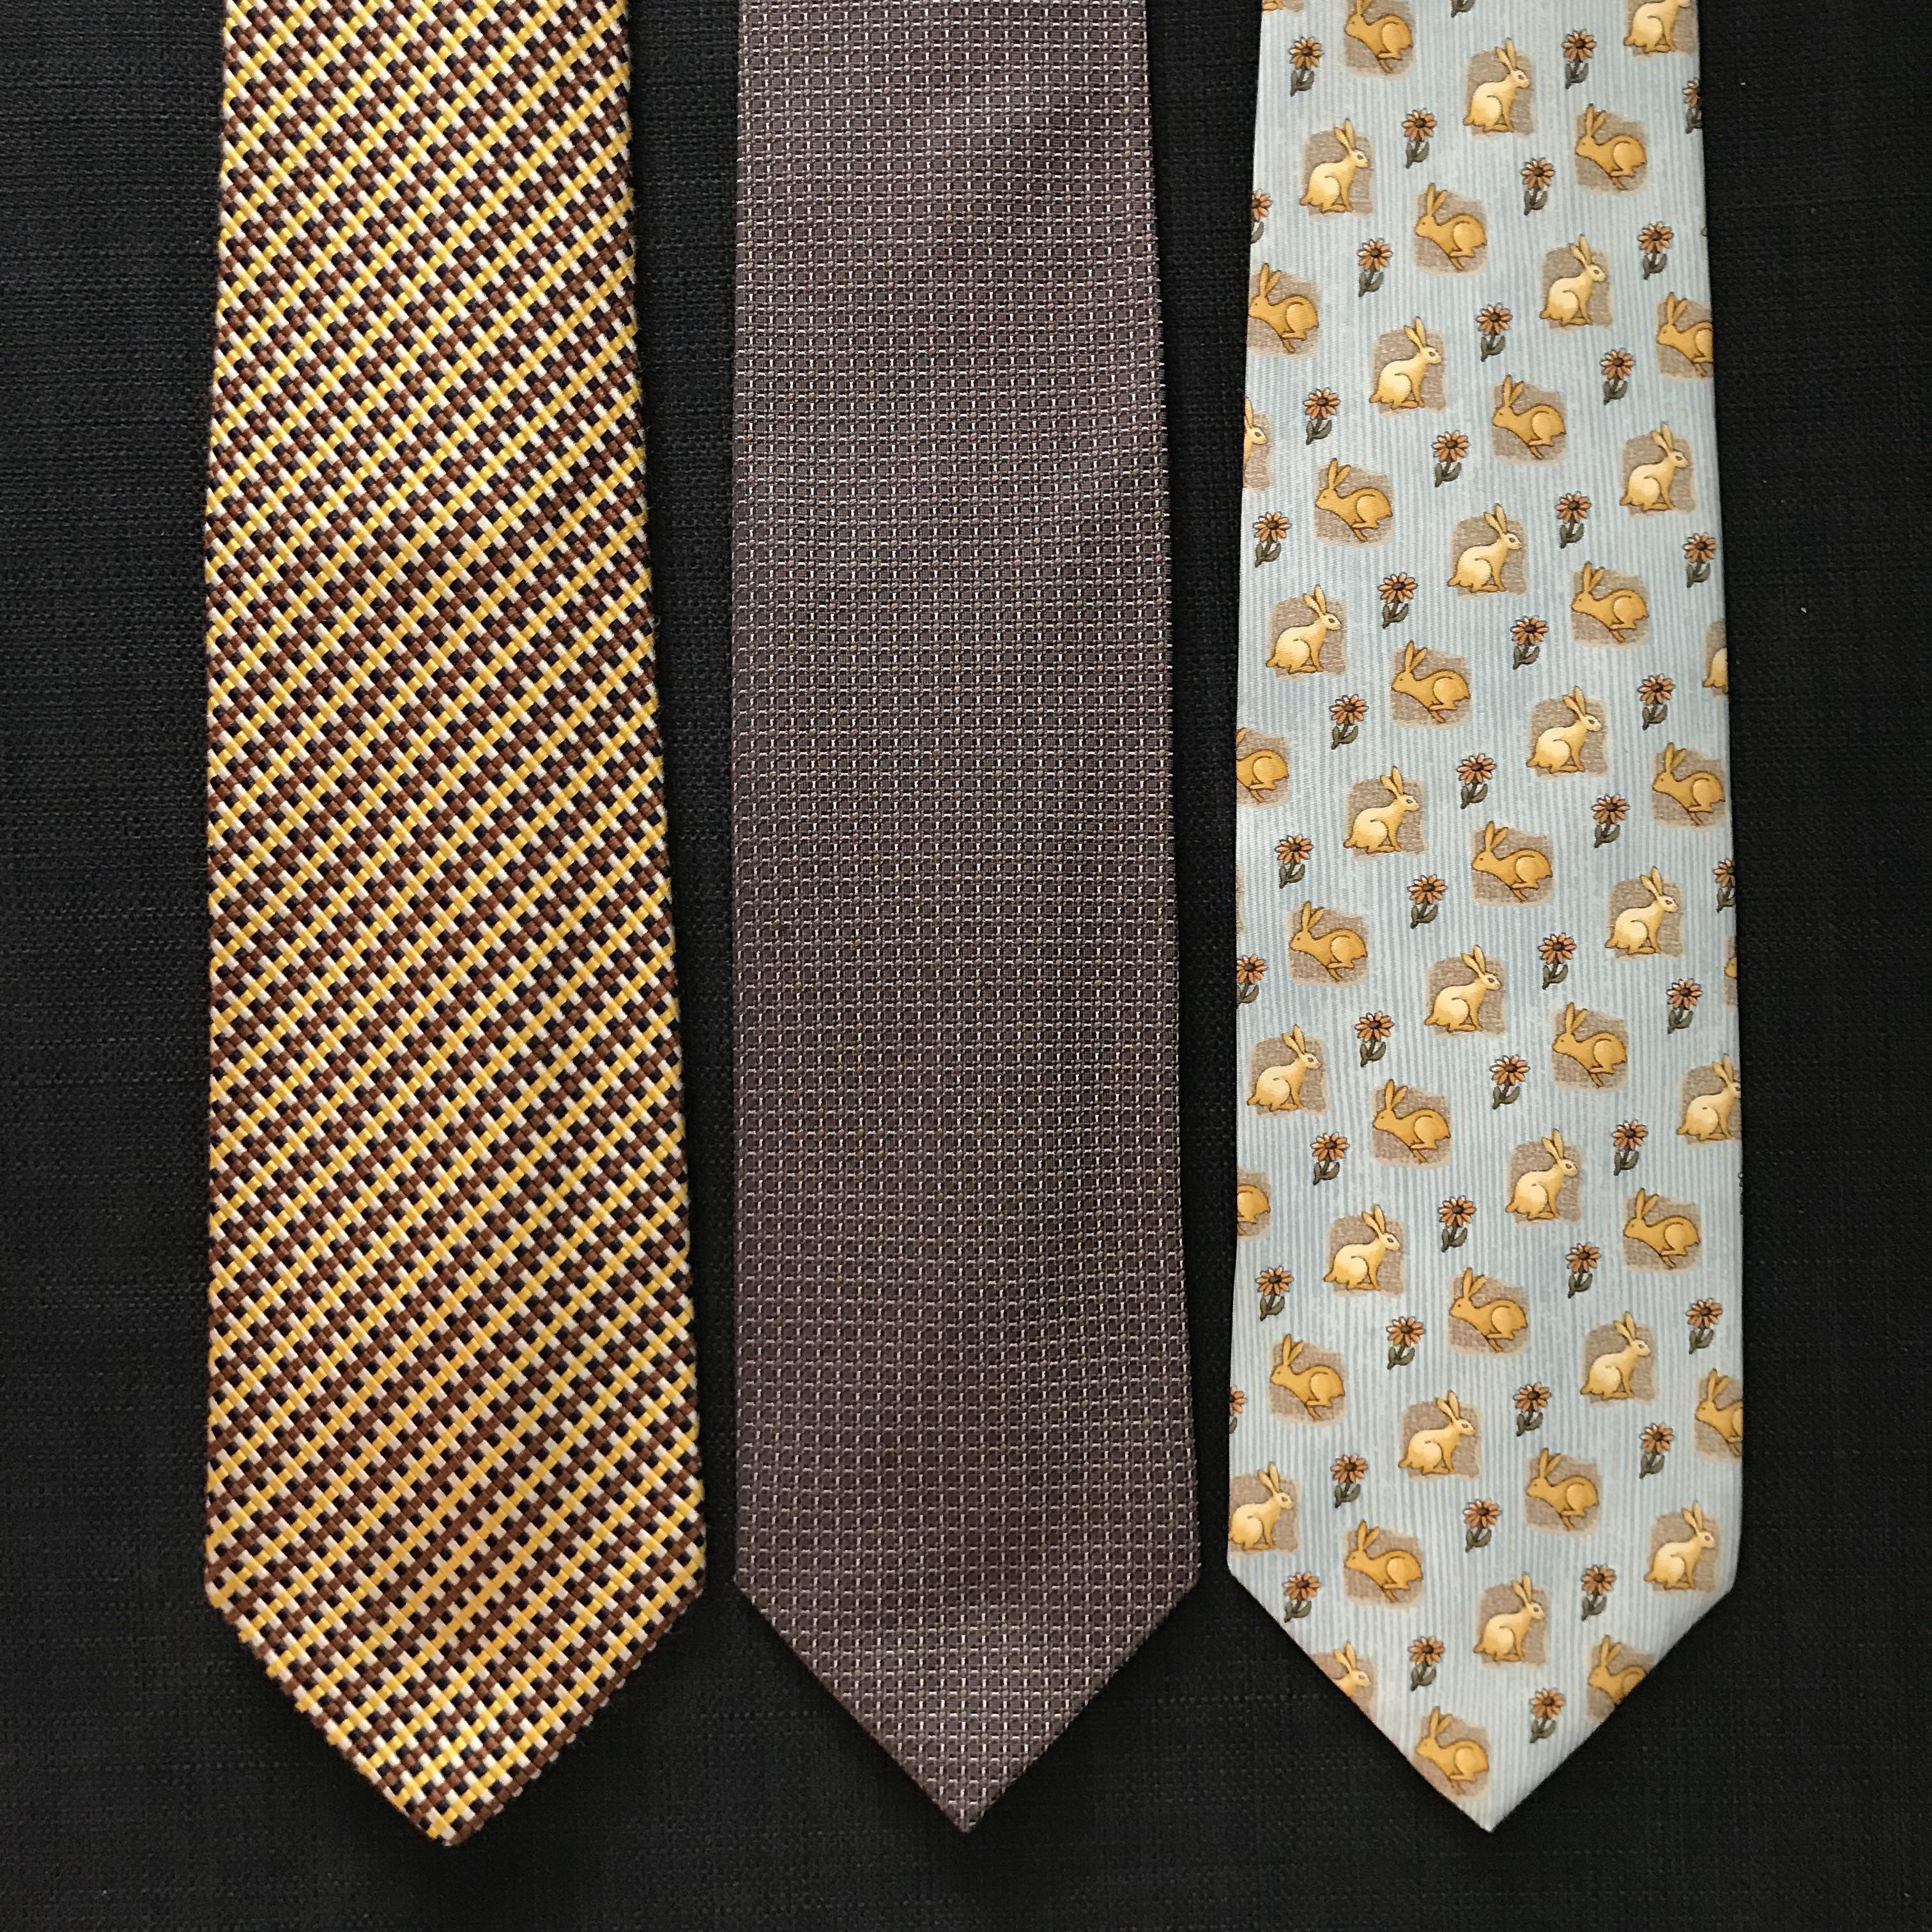 2c9c6daf Ermenegildo Zegna ties, Men's Fashion, Accessories, Ties & Formals ...